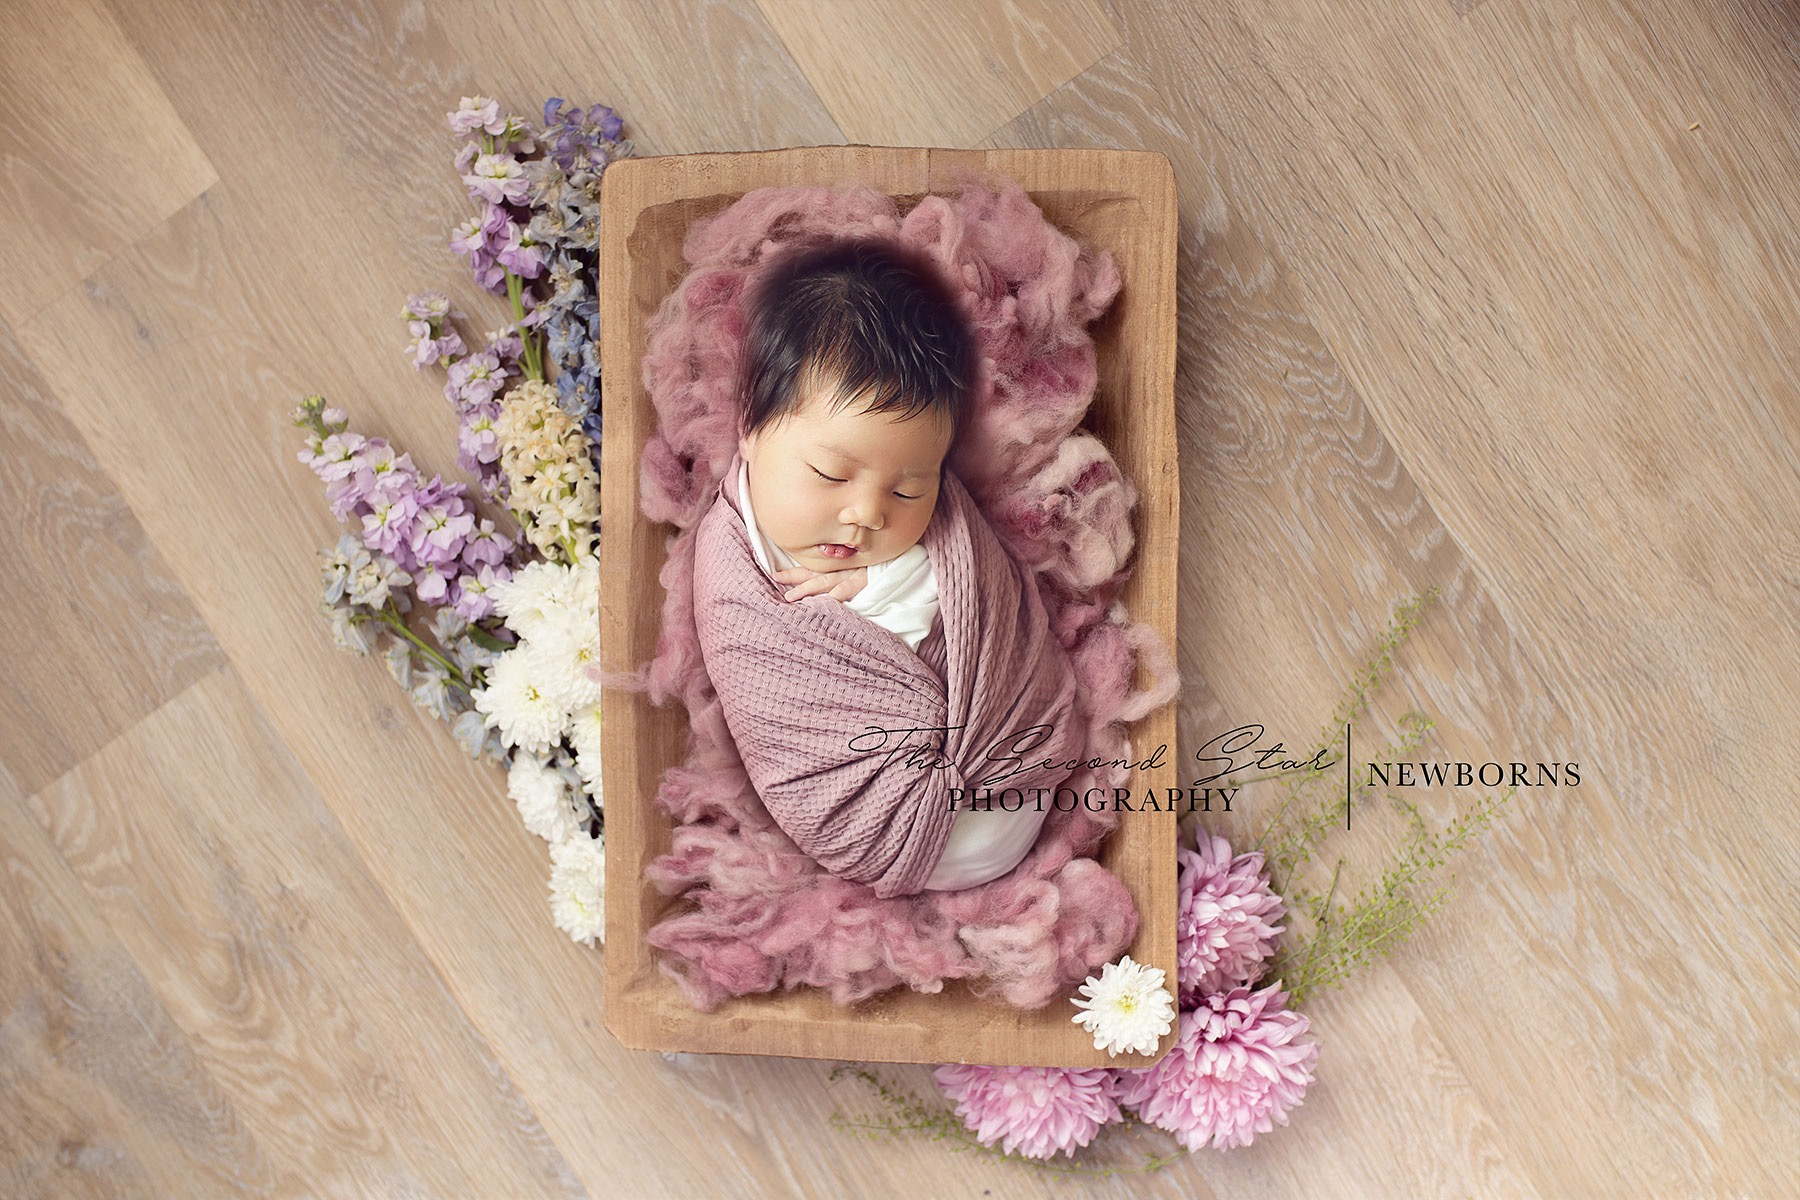 Newborn photographer Bicester, Oxfordshire